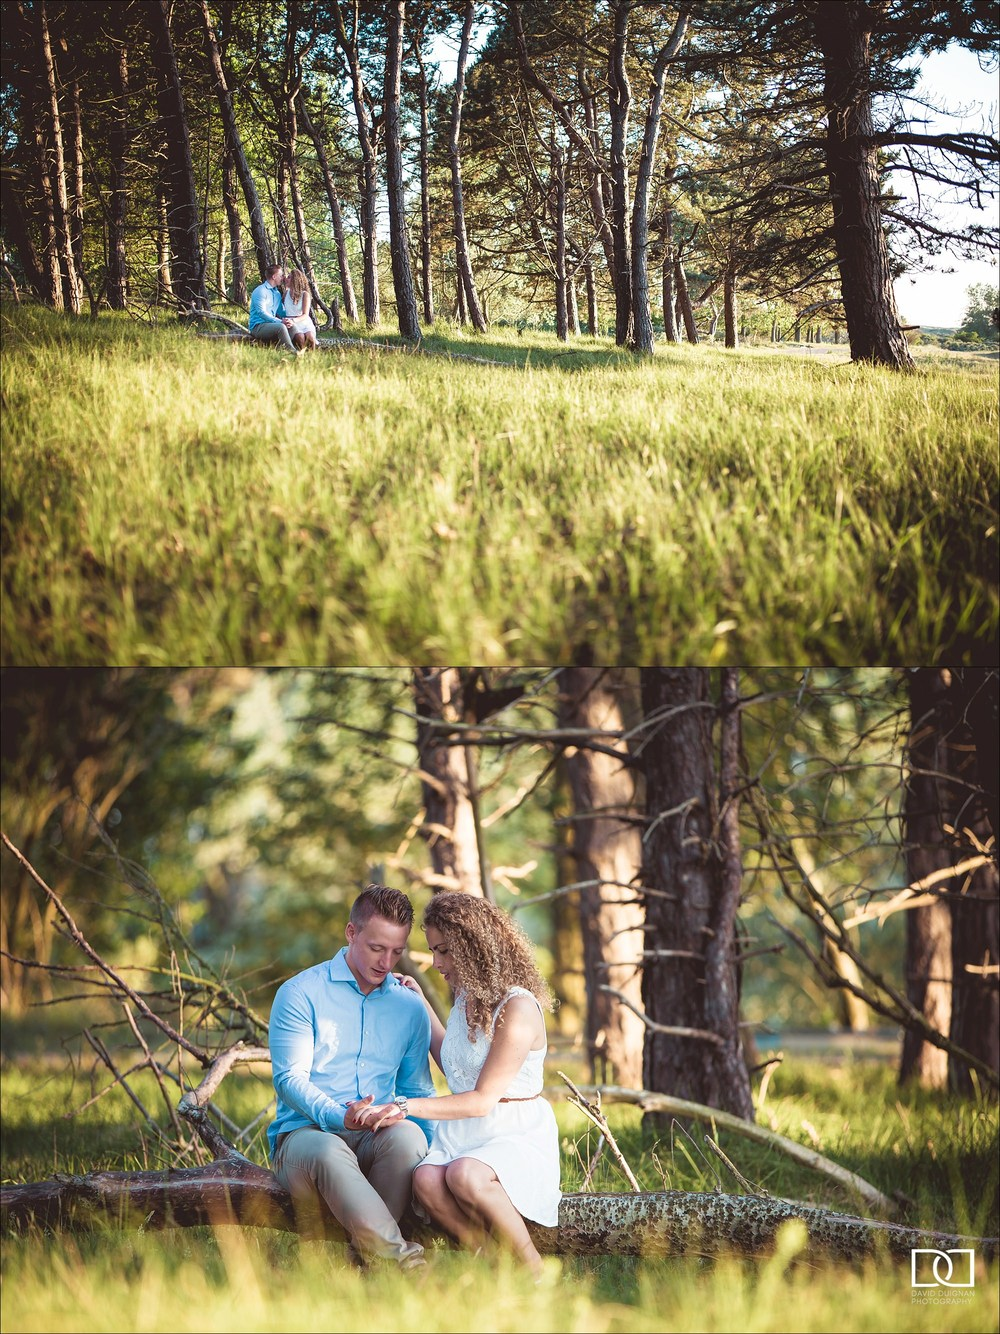 dublin_wedding_photographer_david_duignan_photography_engagement_shoot_Ireland_0010.jpg